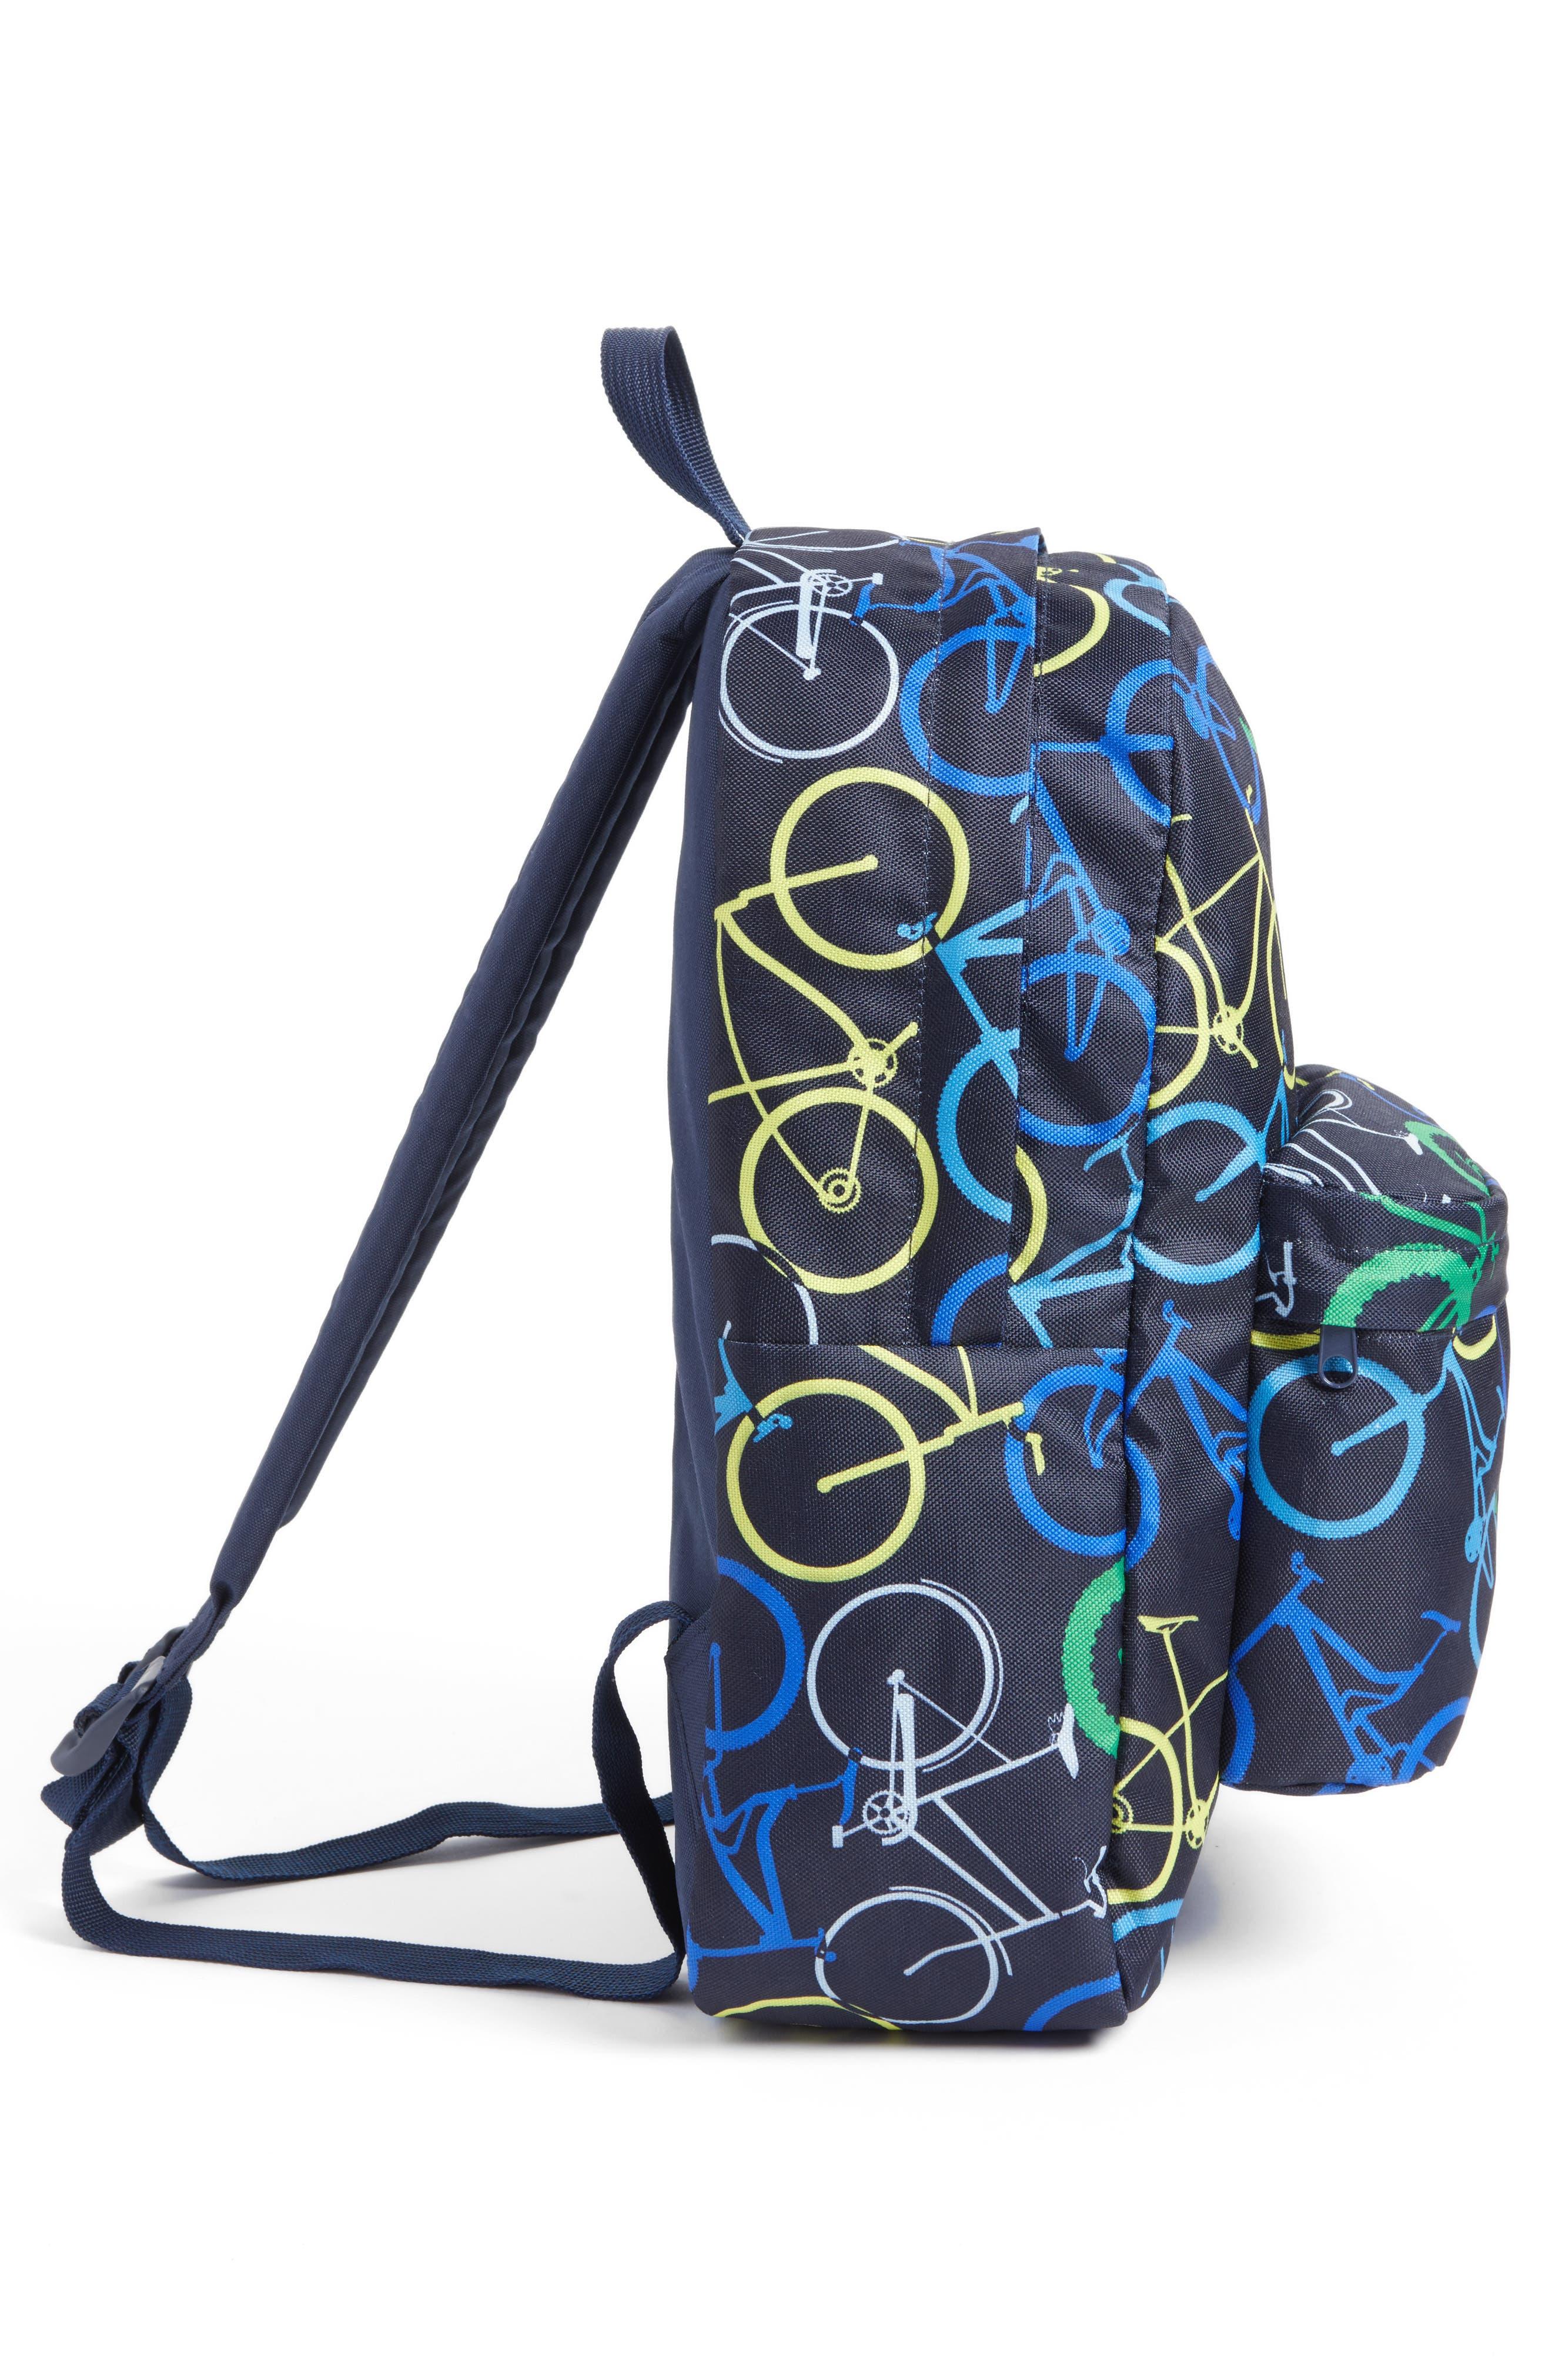 Flying Scot Backpack,                             Alternate thumbnail 4, color,                             411